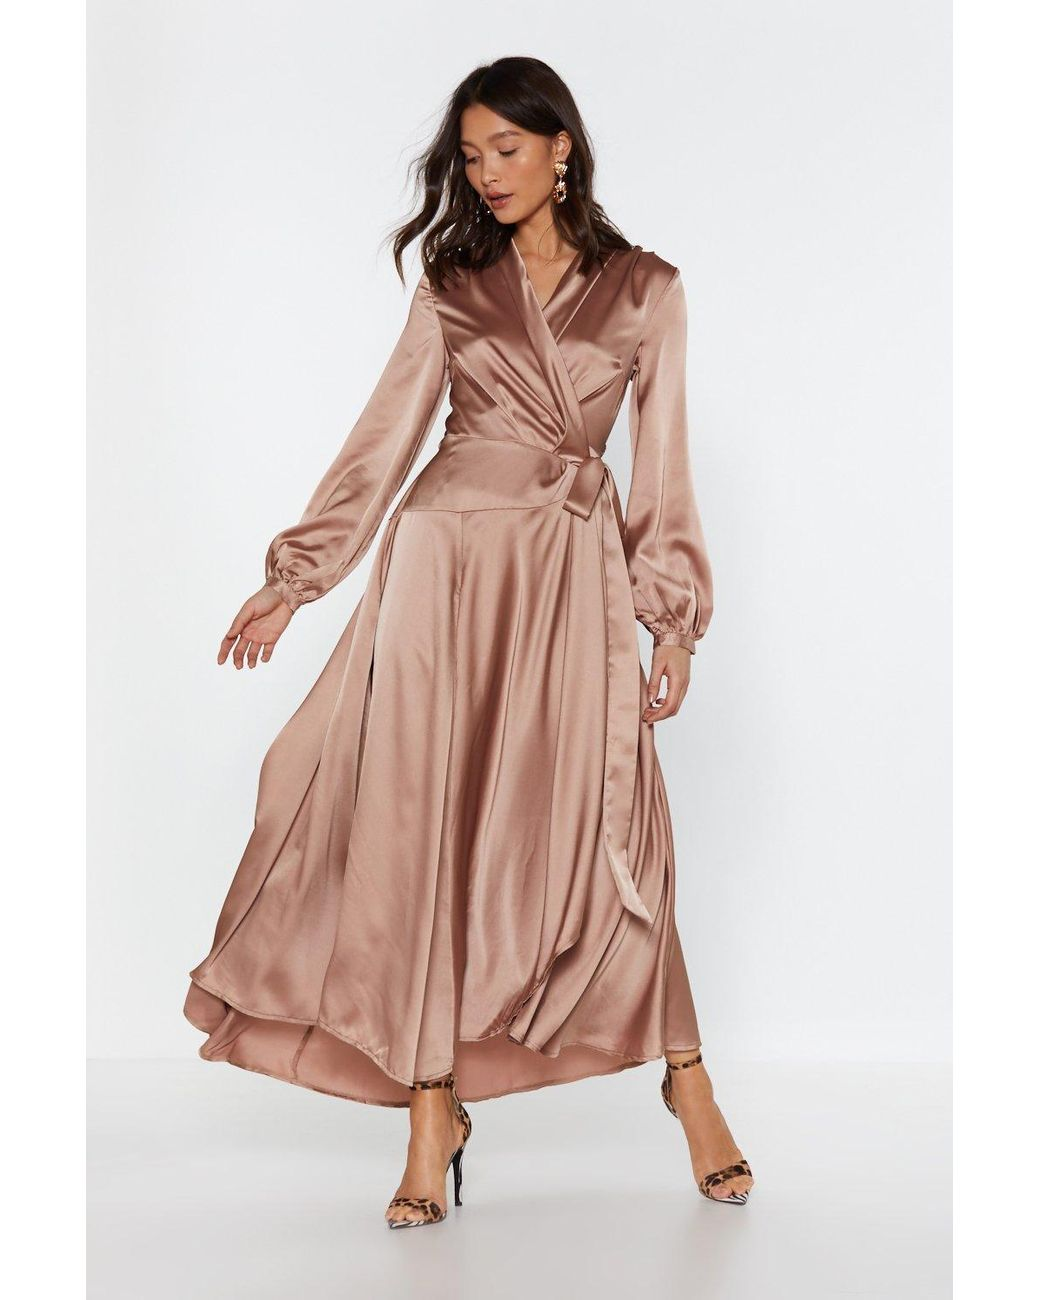 Women's Pink Satin Long Sleeve Maxi Wrap Dress